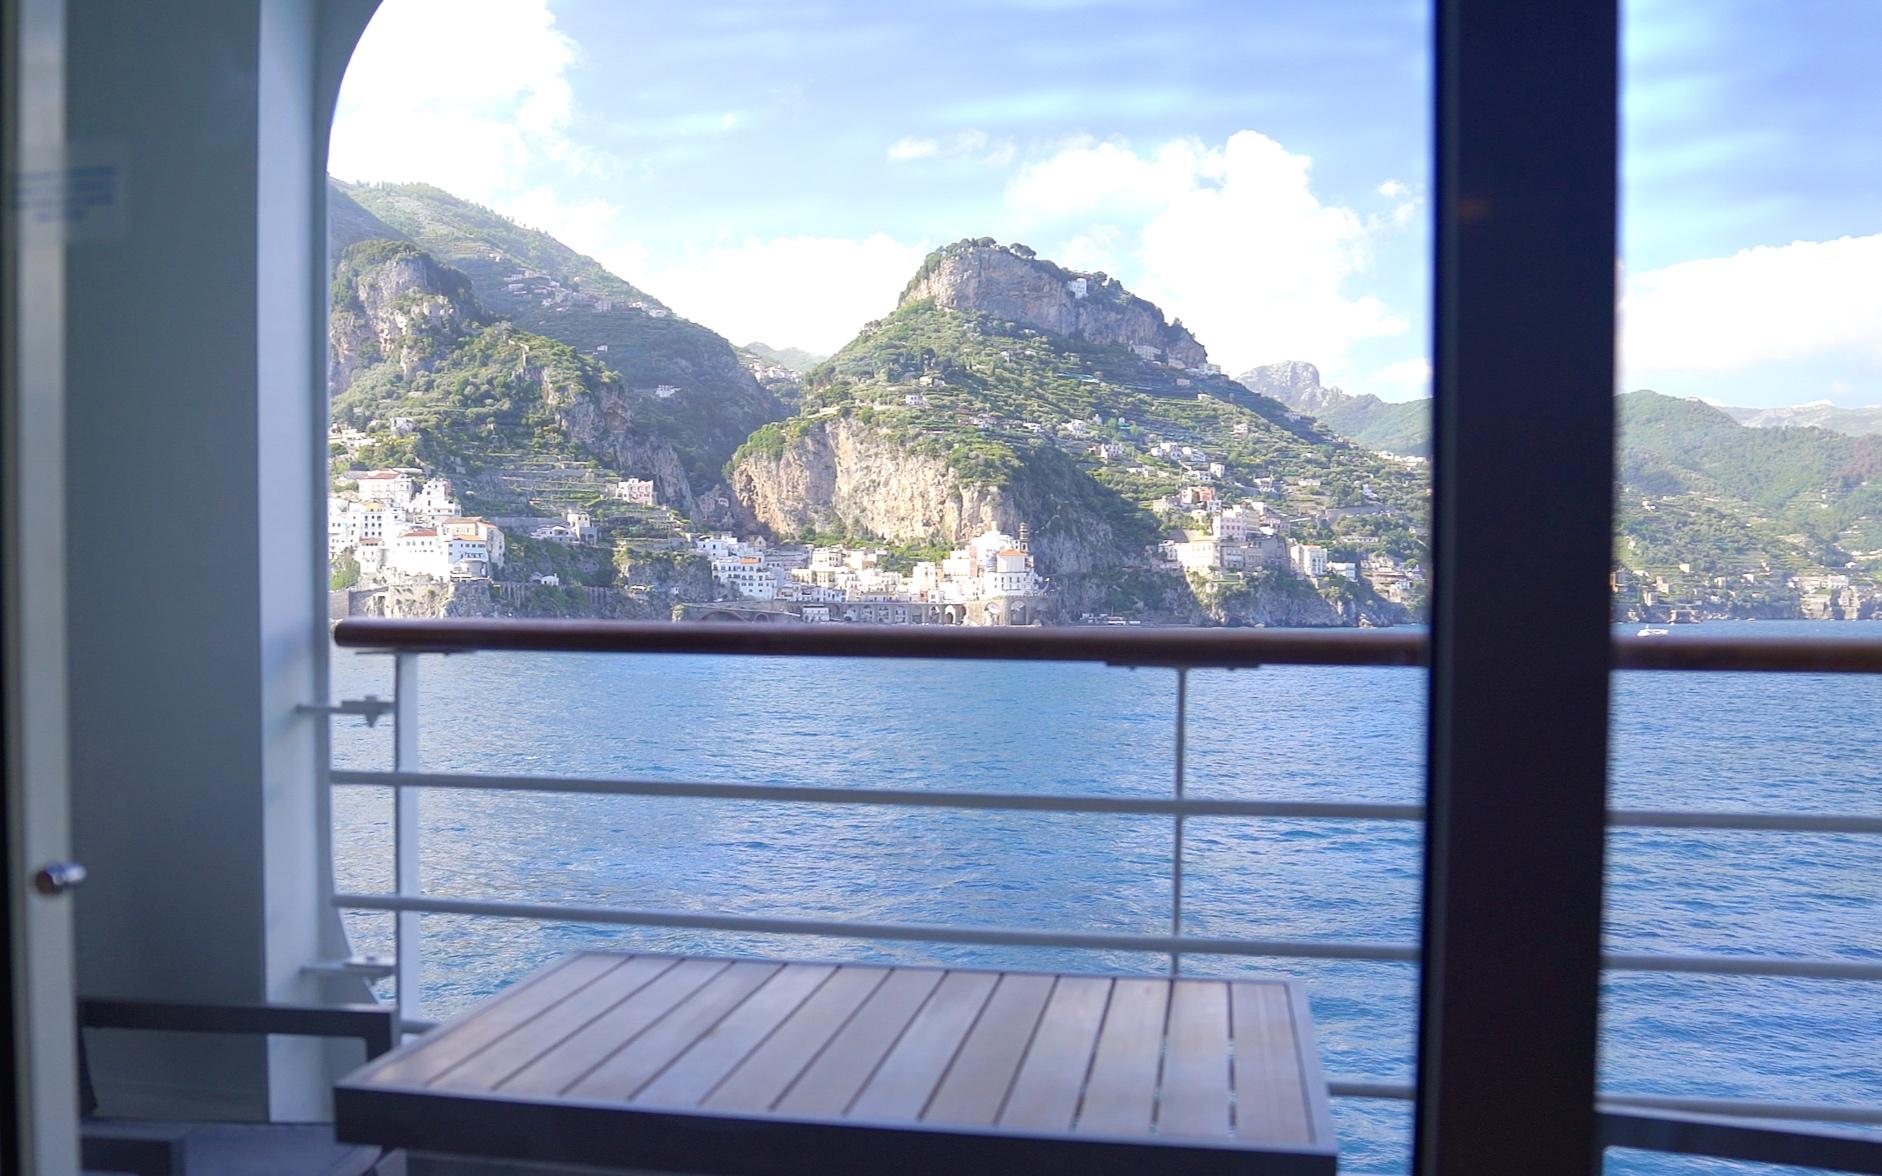 Arriving in Amalfi.